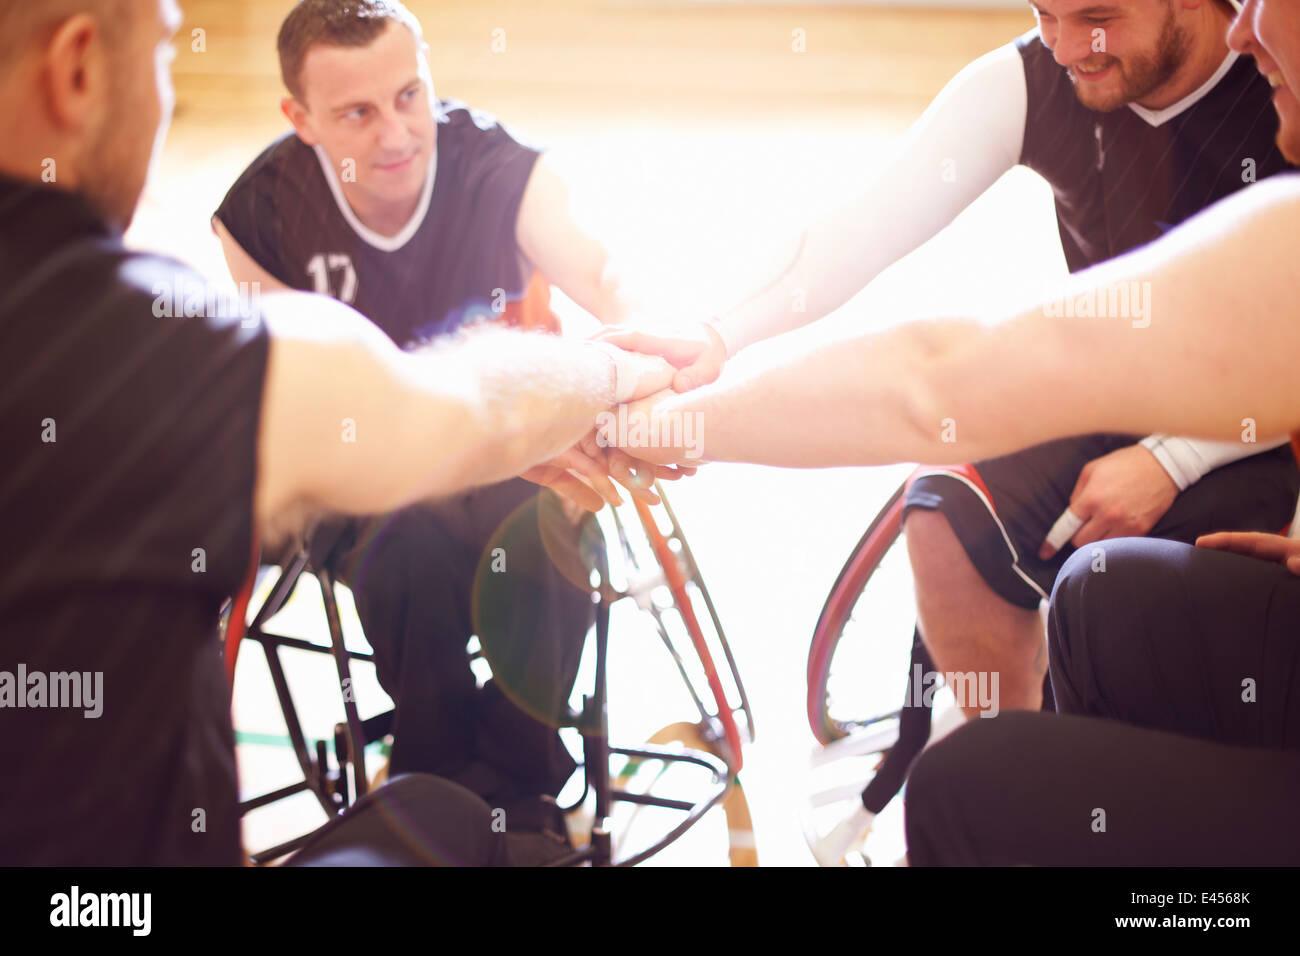 Wheelchair basketball players display team encouragement - Stock Image